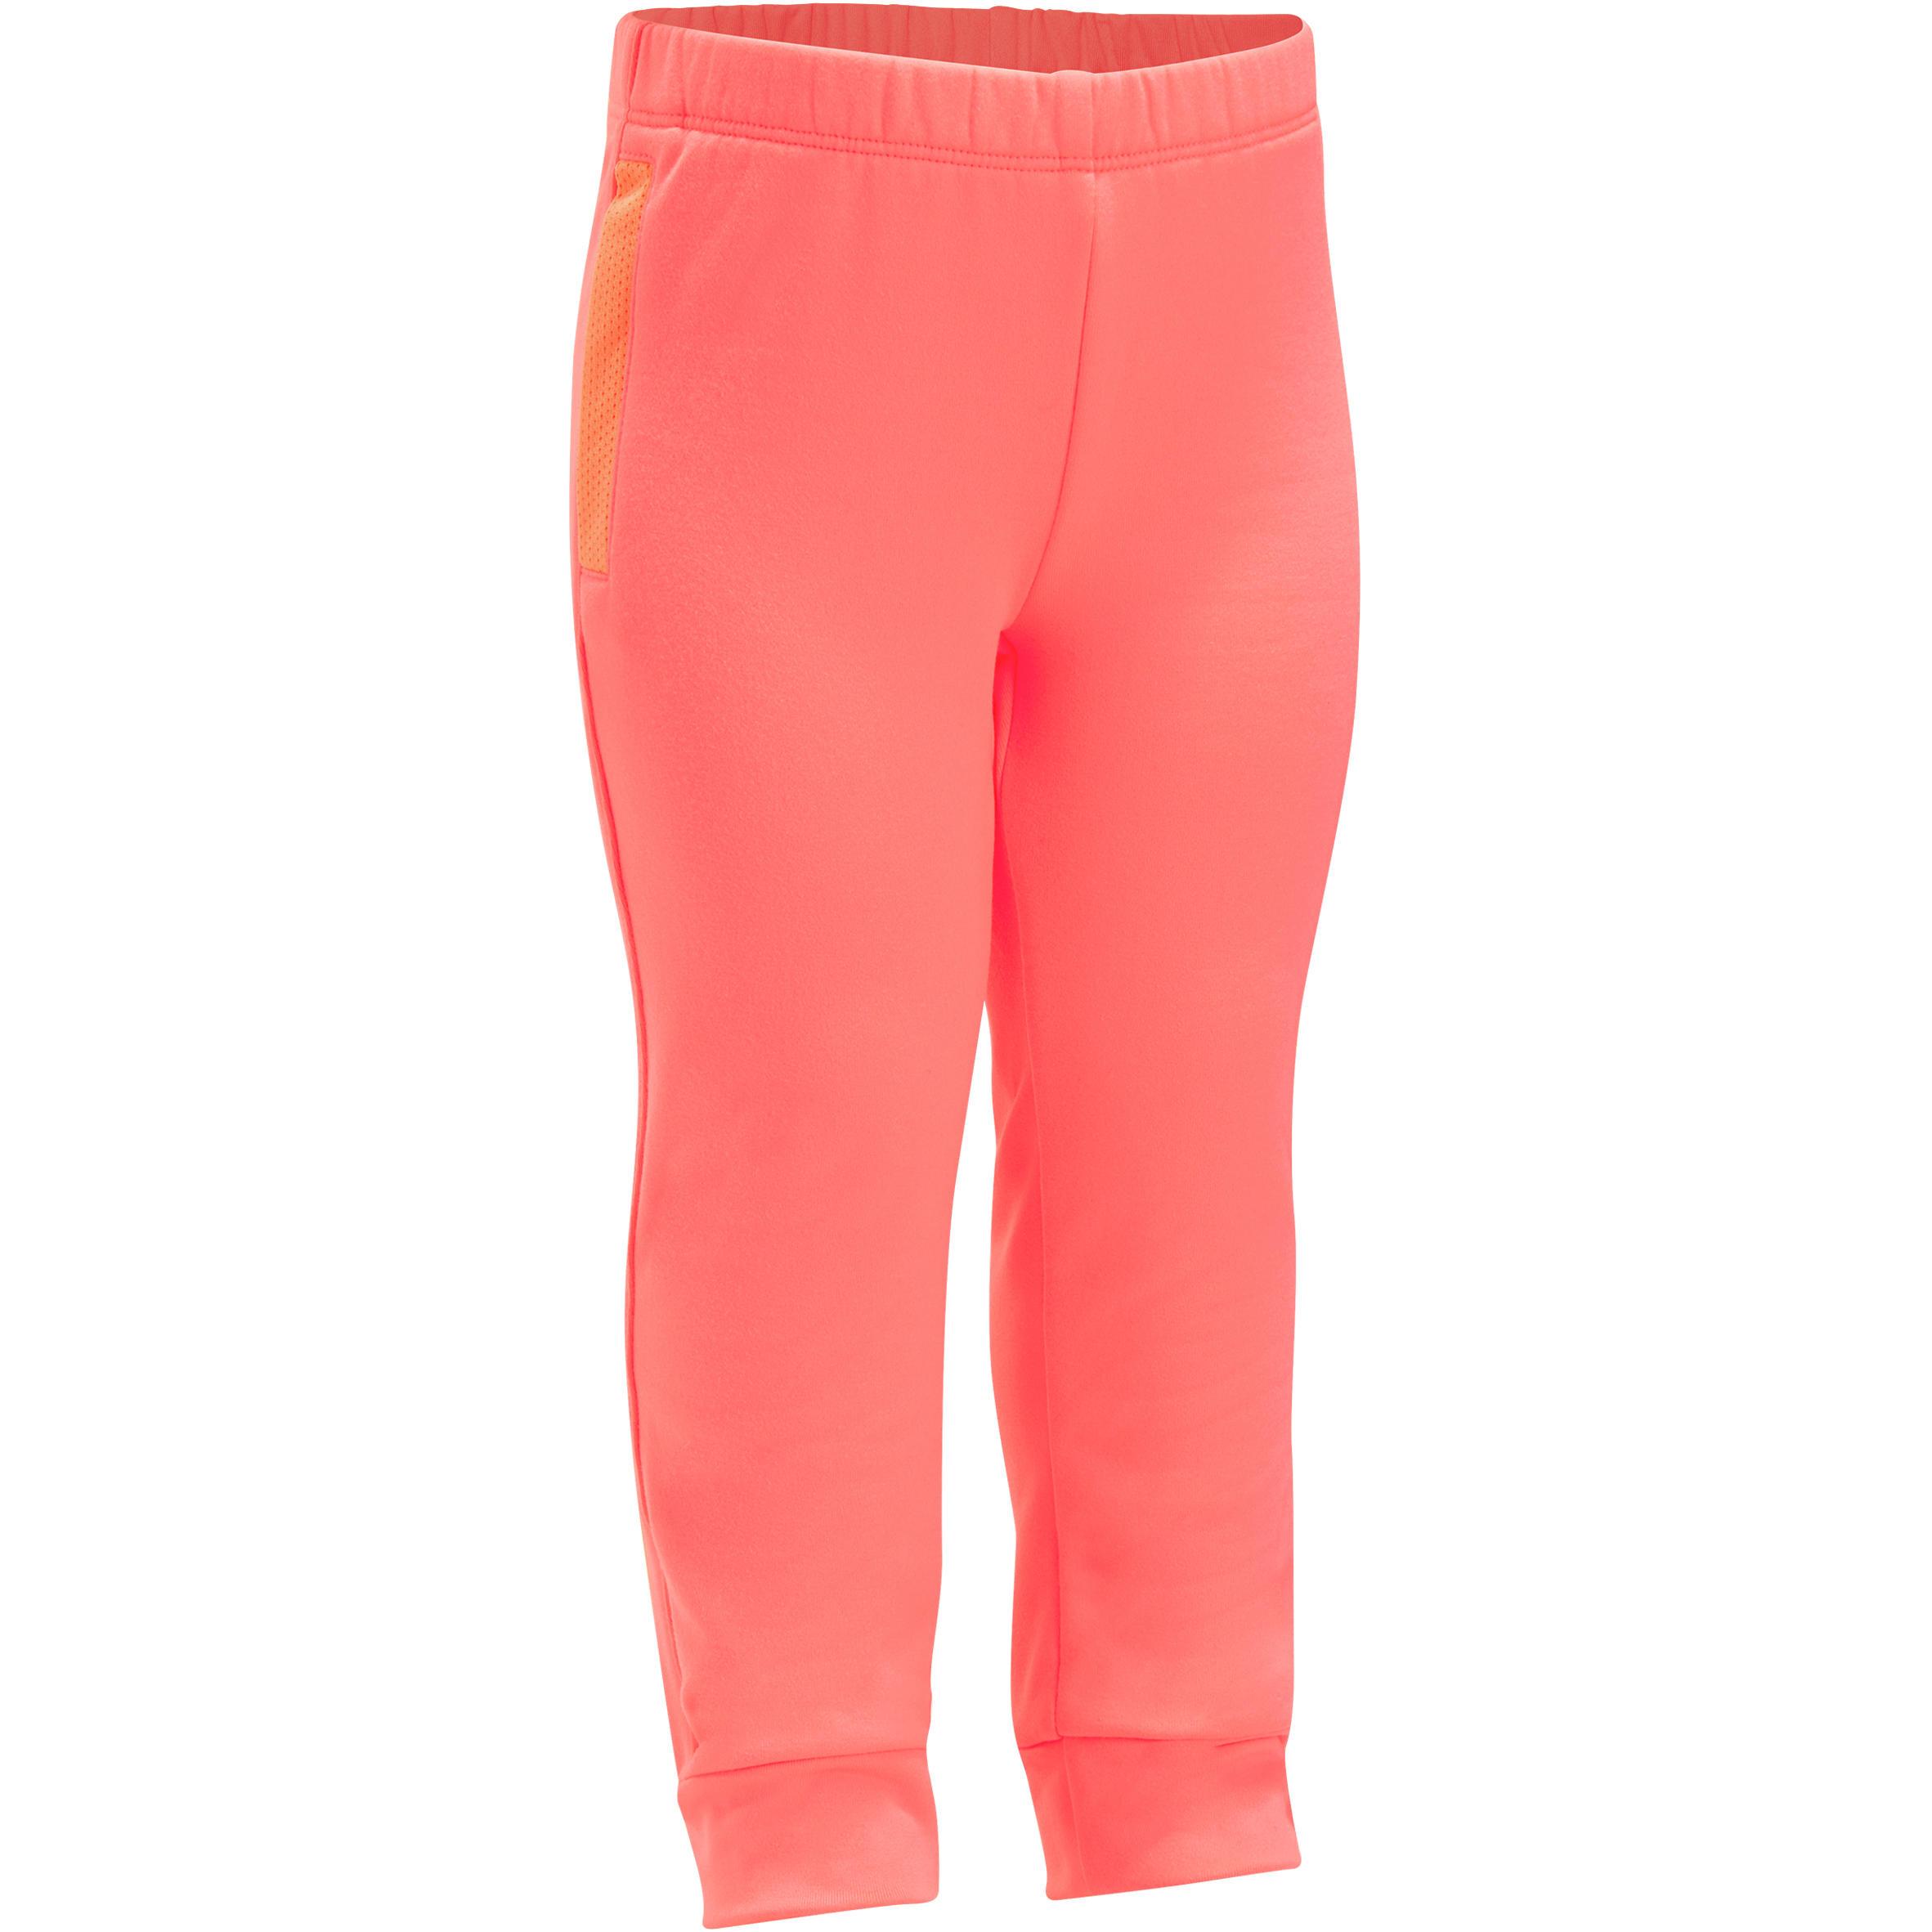 Pants 560 cálido gimnasia infantil rosa